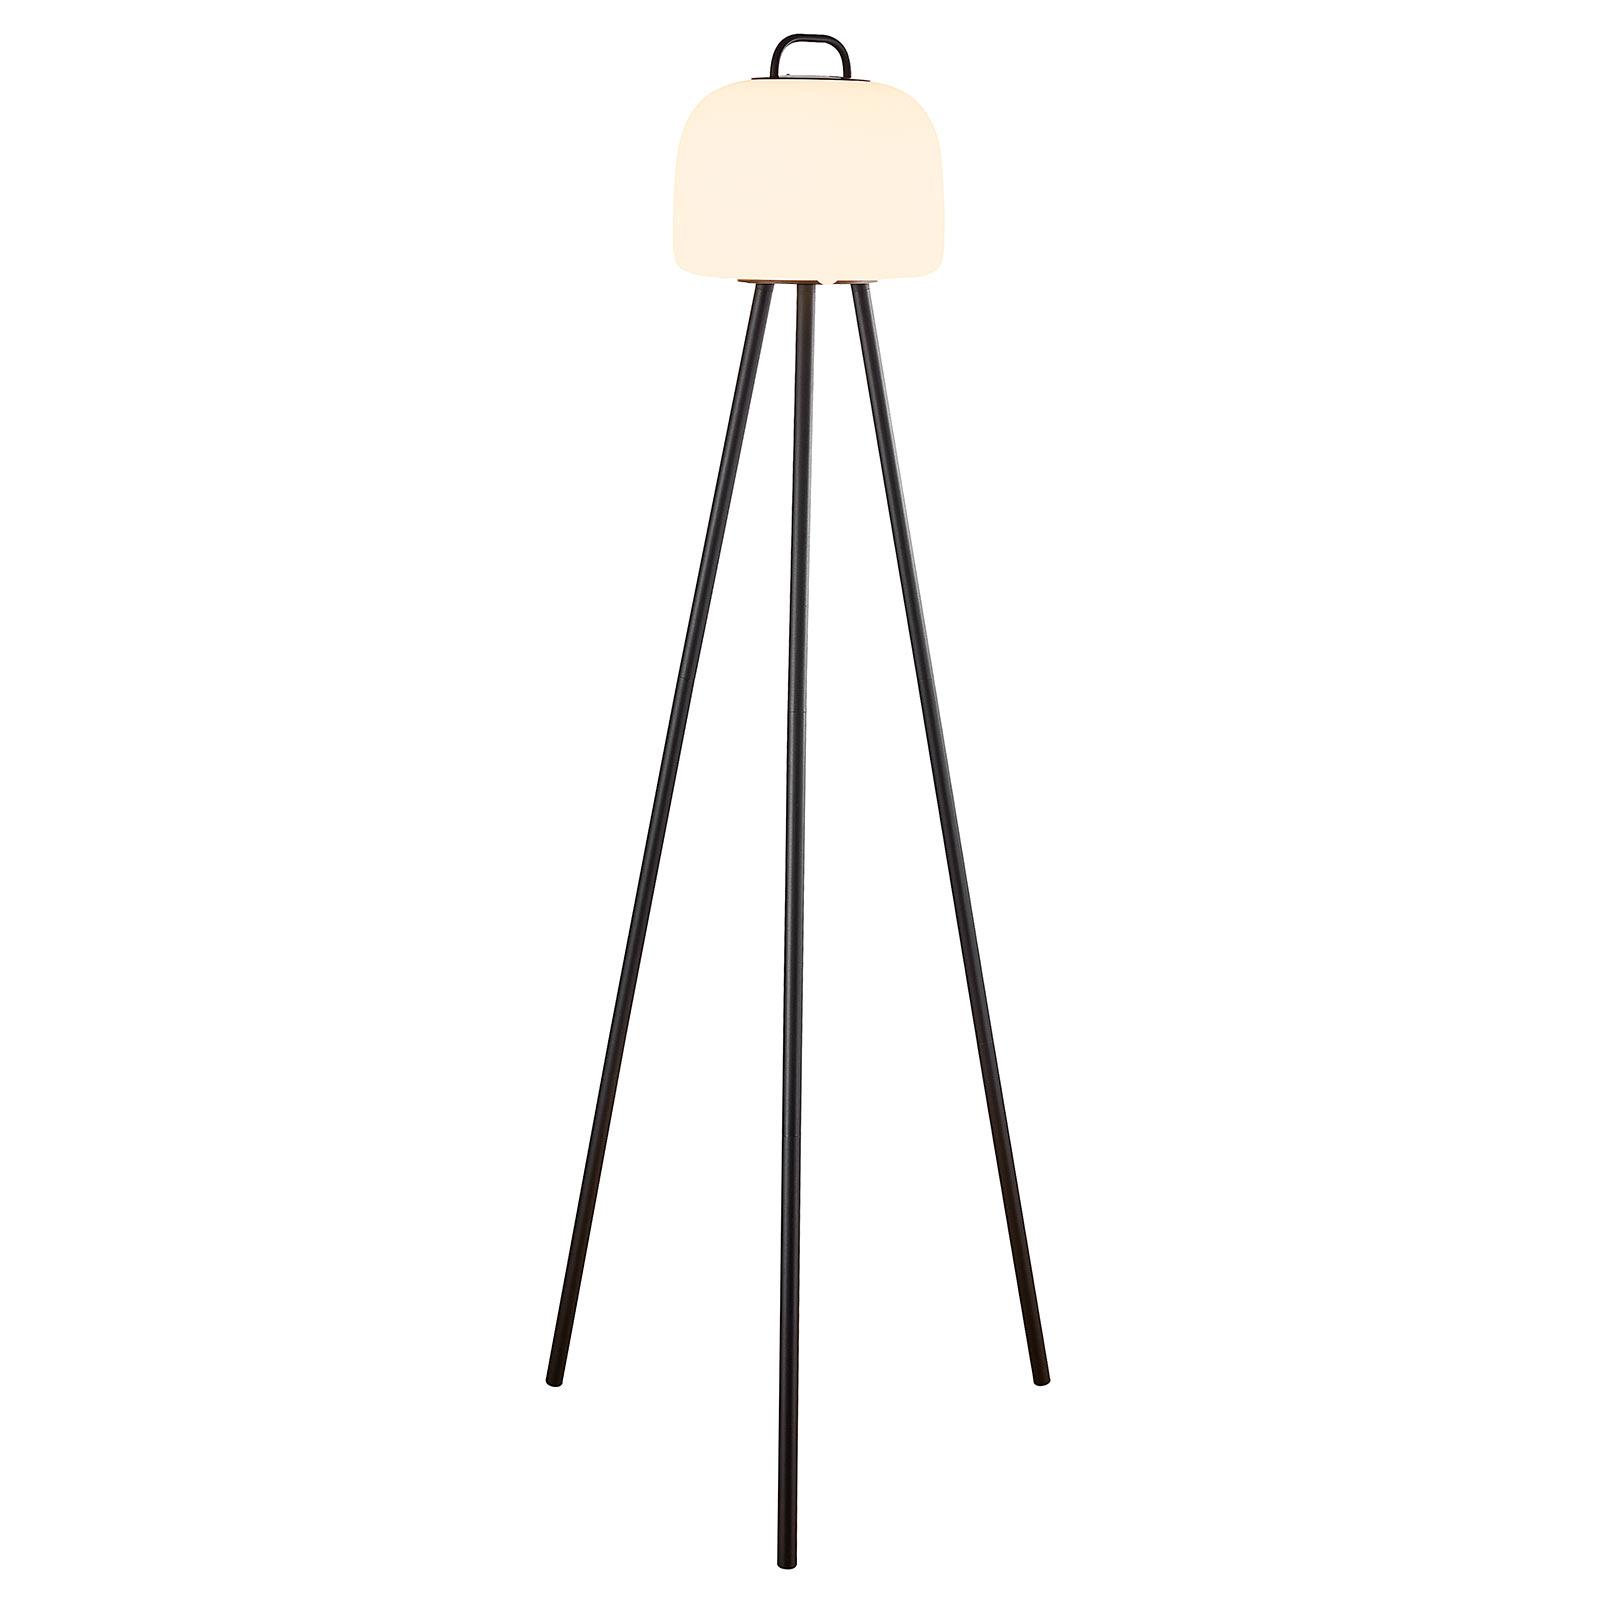 LED-Stehleuchte Kettle Tripod Metall, Schirm 22cm